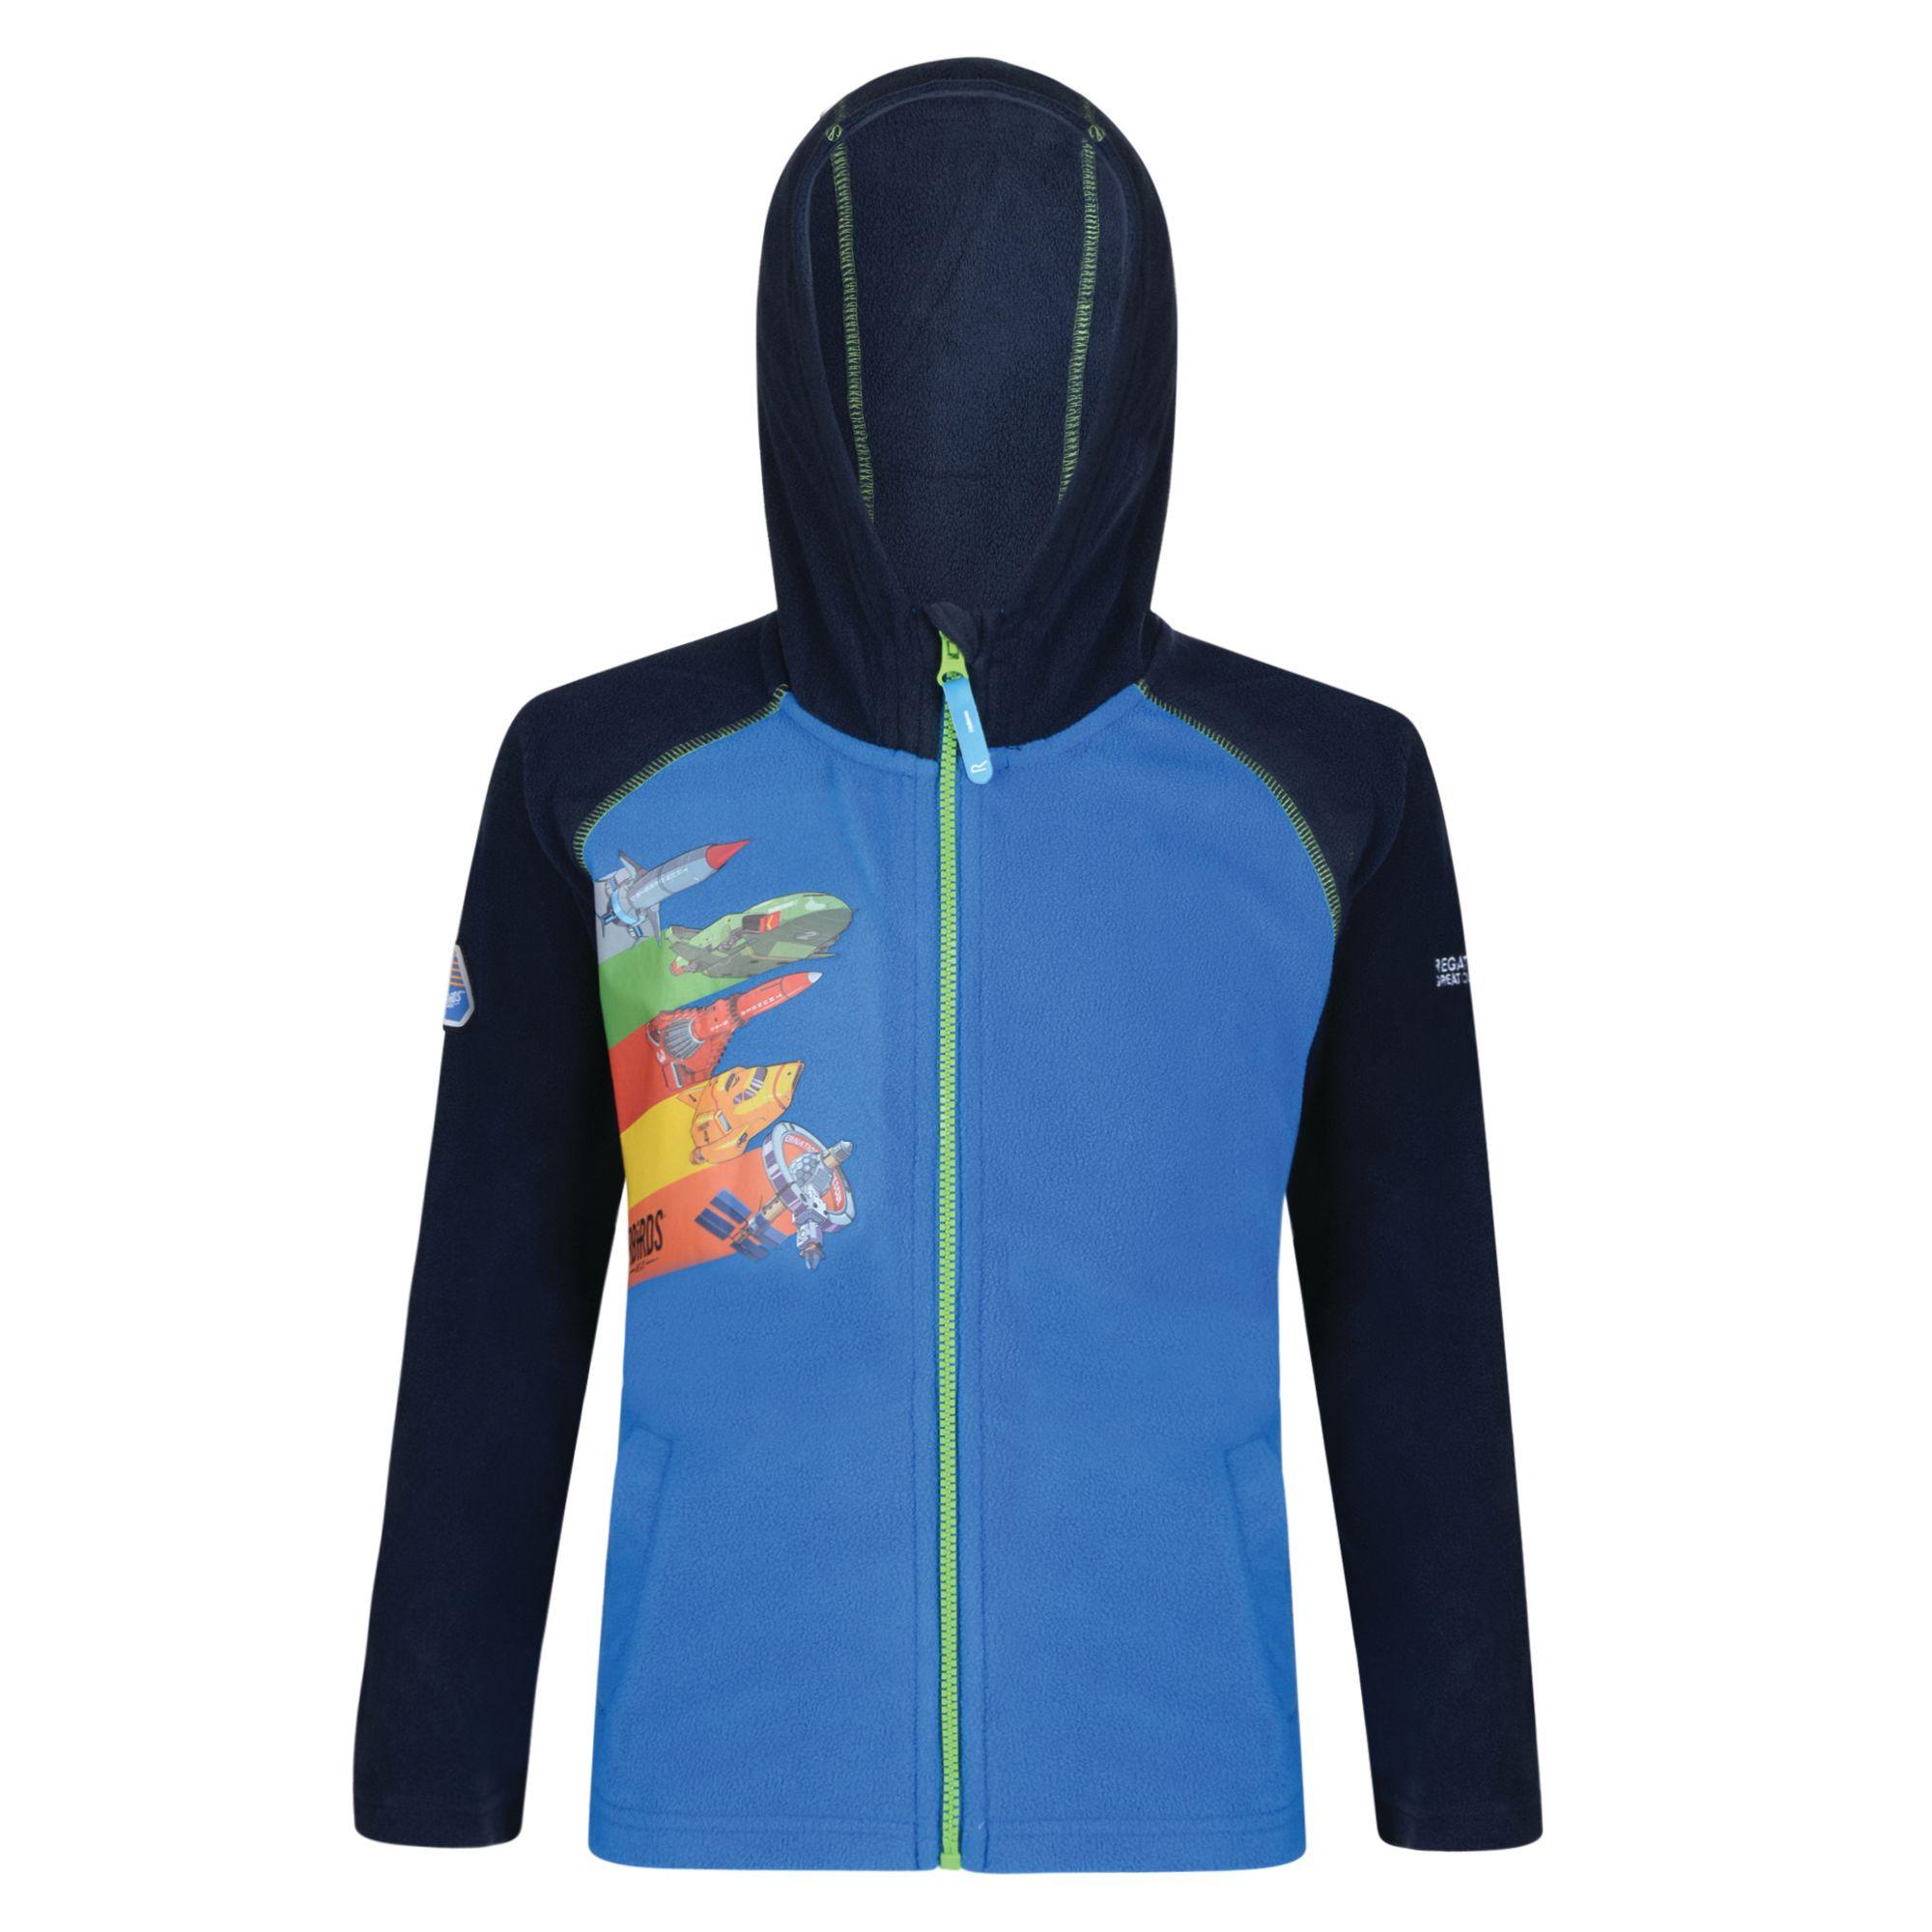 Regatta-Thunderbirds-Childrens-Kids-Official-Hyperspeed-Hooded-Fleece-Jacket